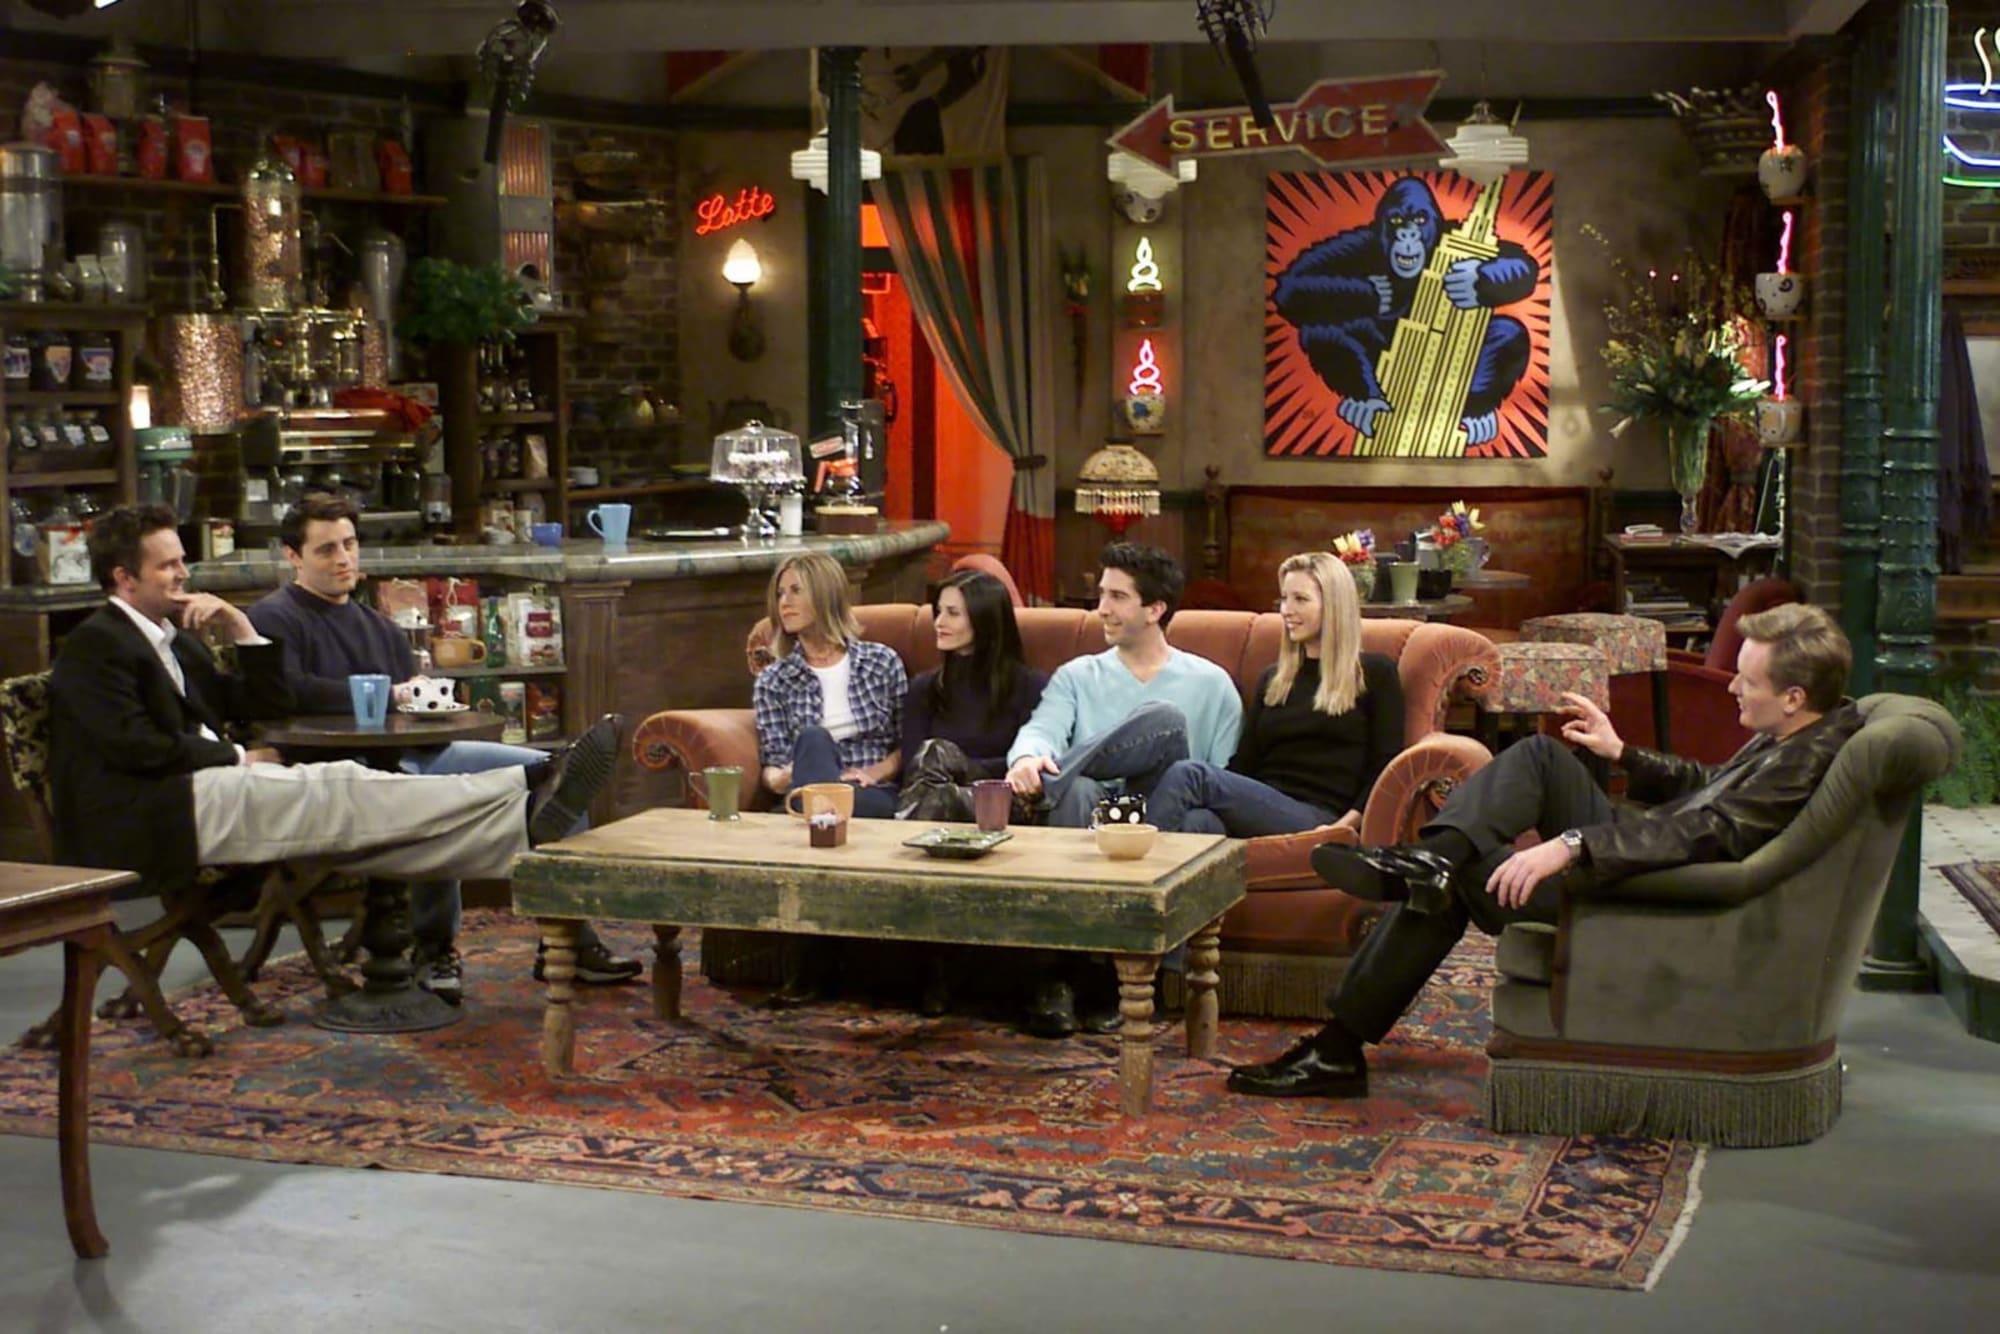 The Friends reunion gets an update from Lisa Kudrow